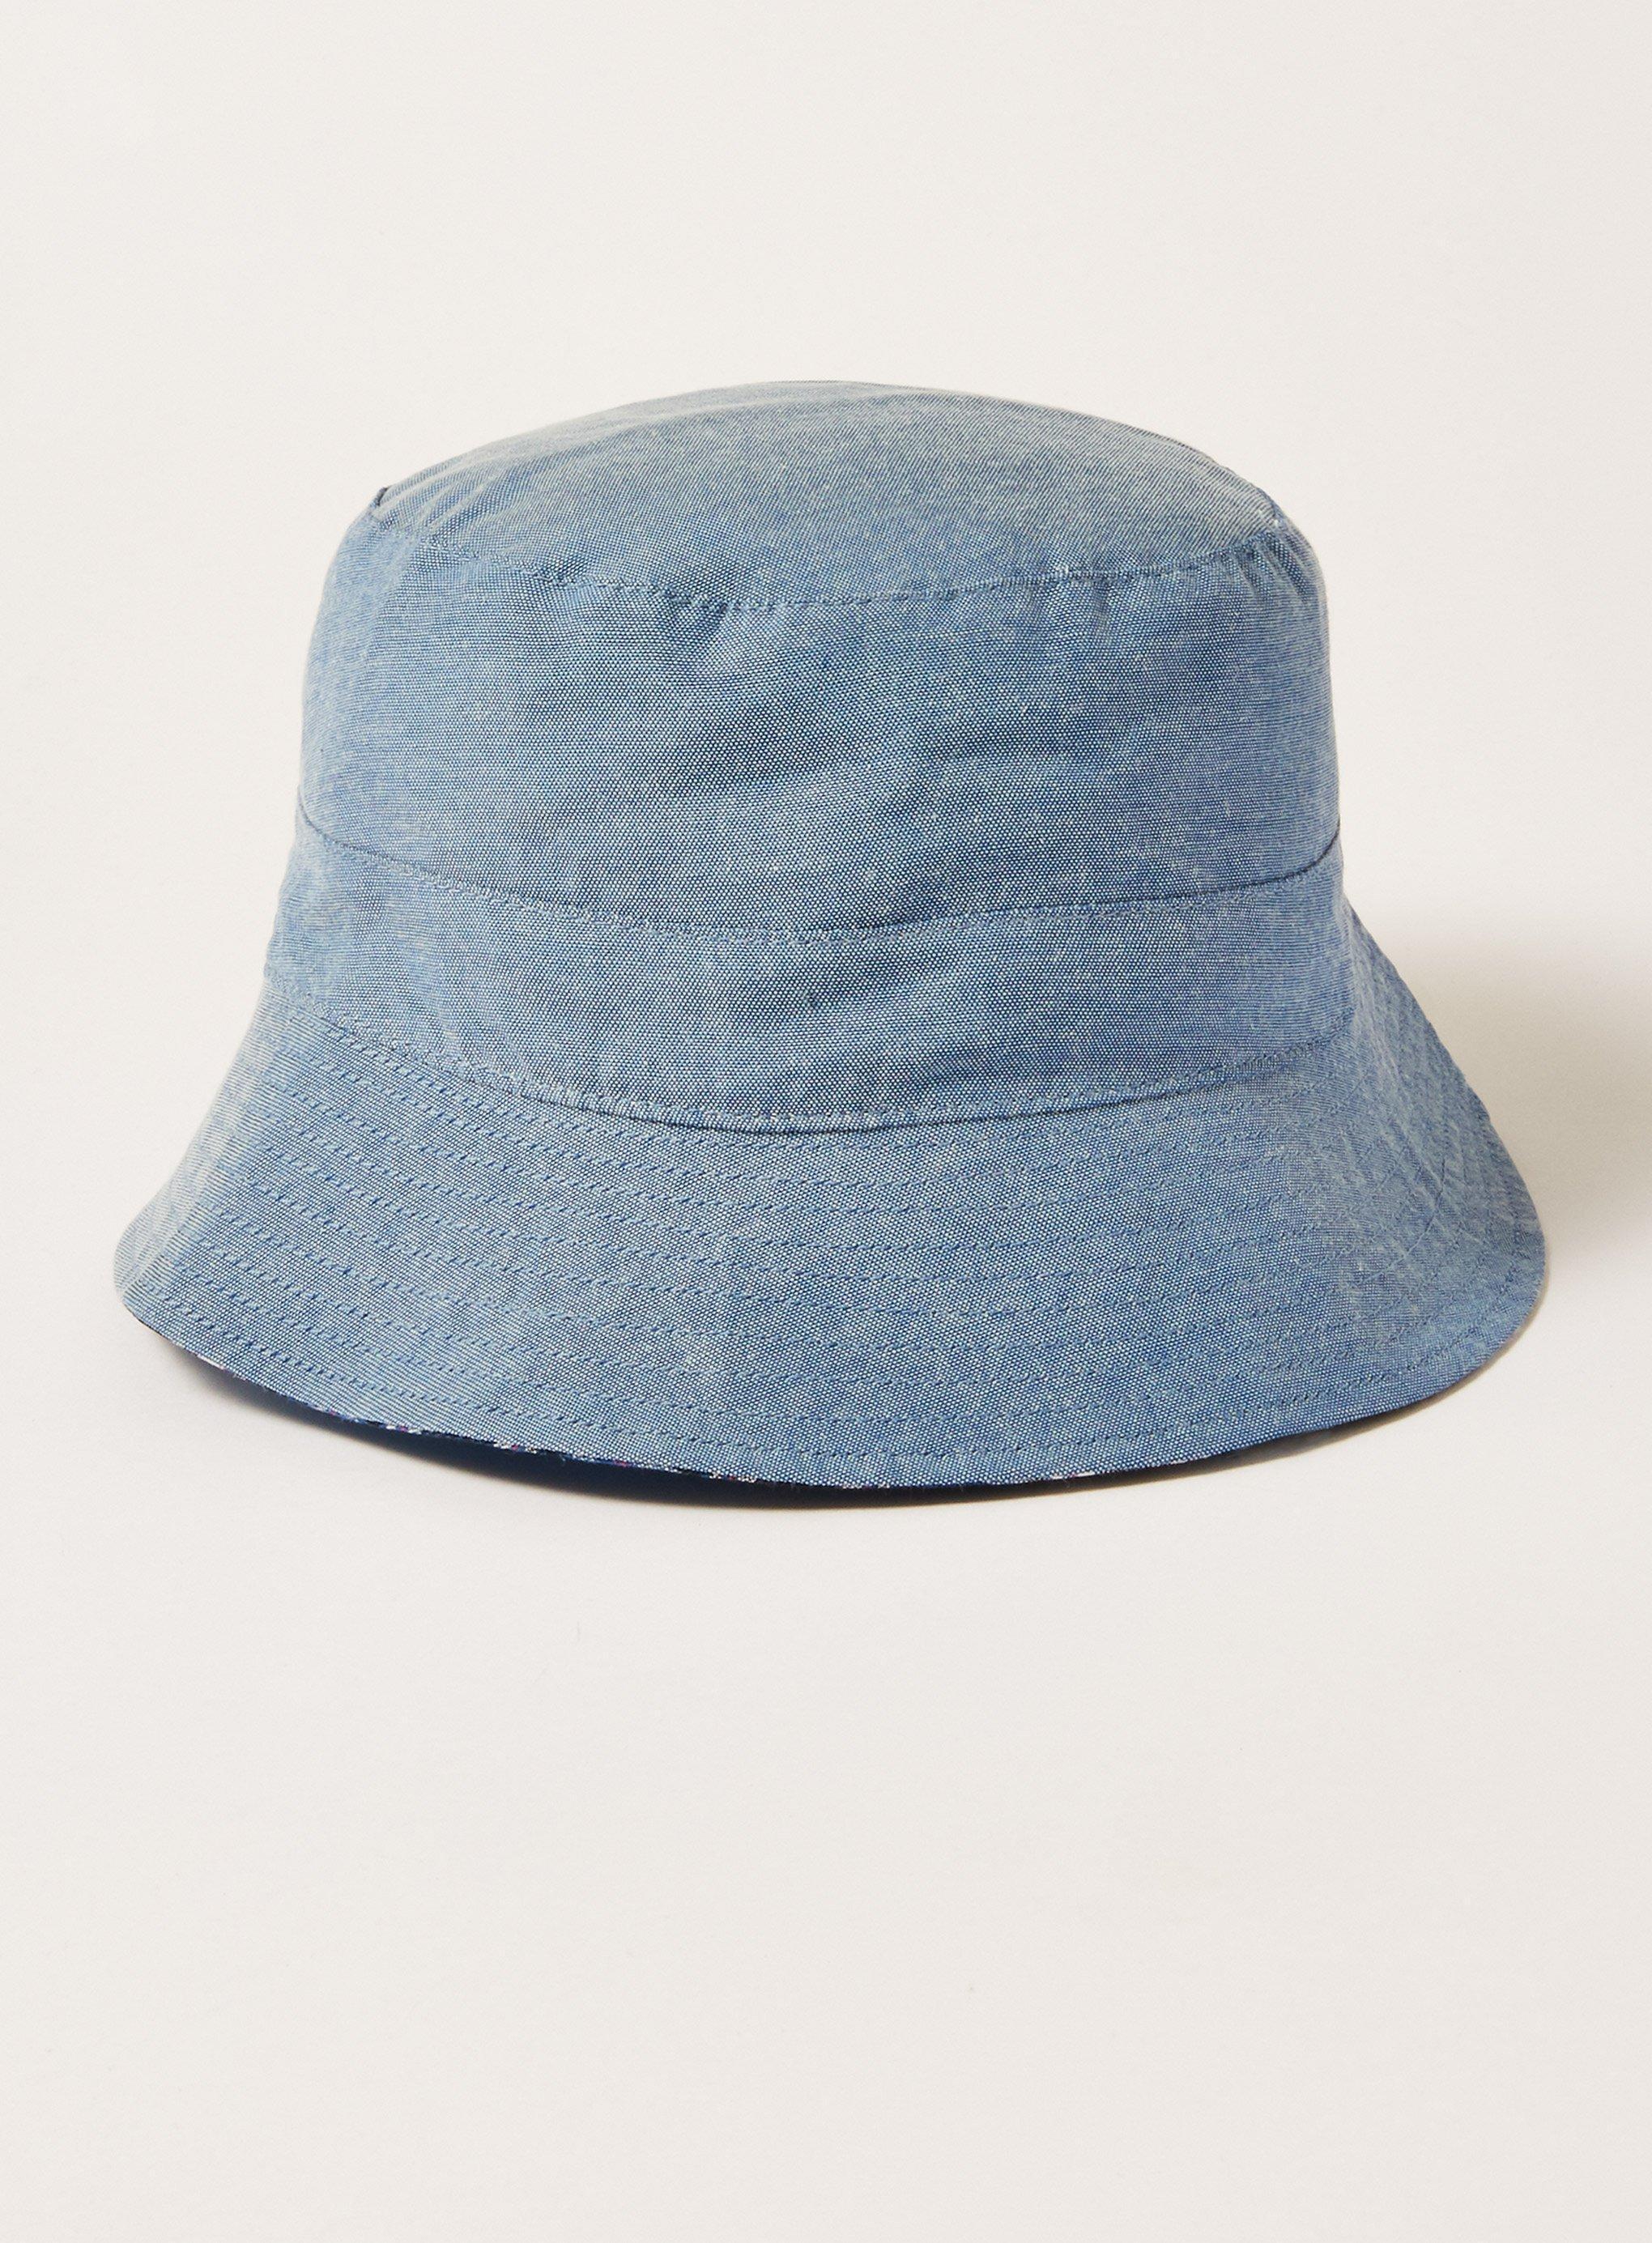 Lyst - Topman Denim And Check Revere Bucket Hat in Blue for Men b0b40634b98